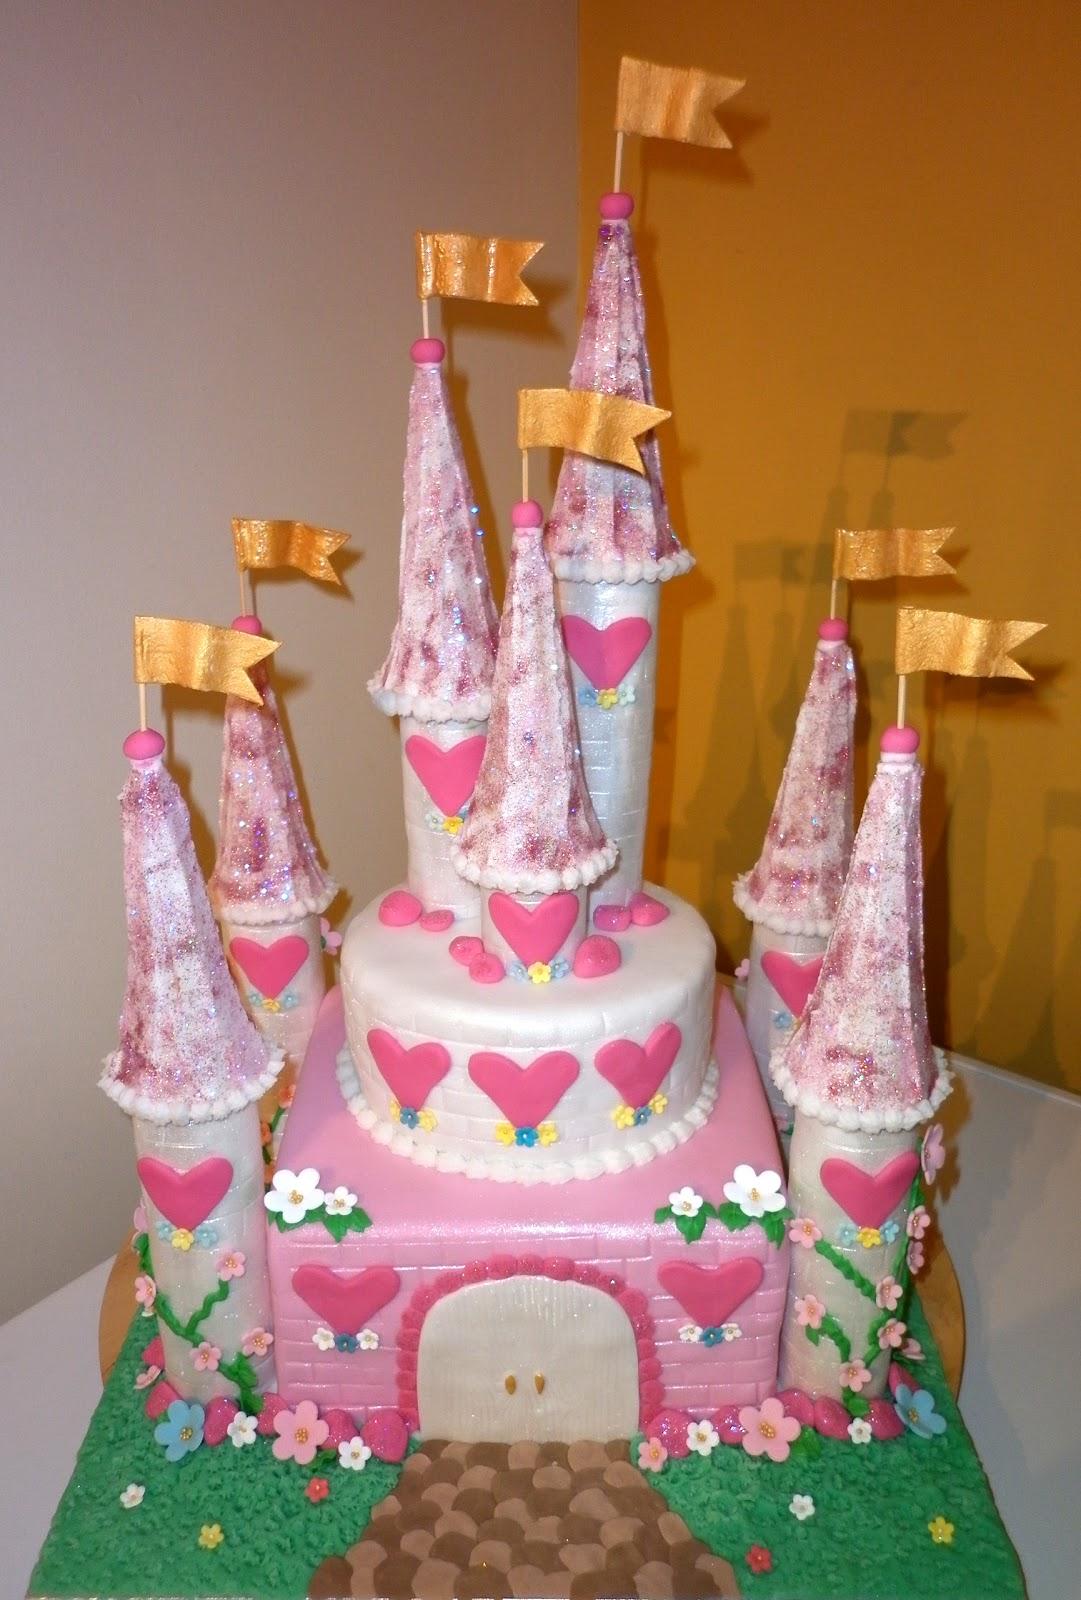 Pictures Of Princess Castle Cake : Caketopia: Hannah s Pink Princess Castle Cake